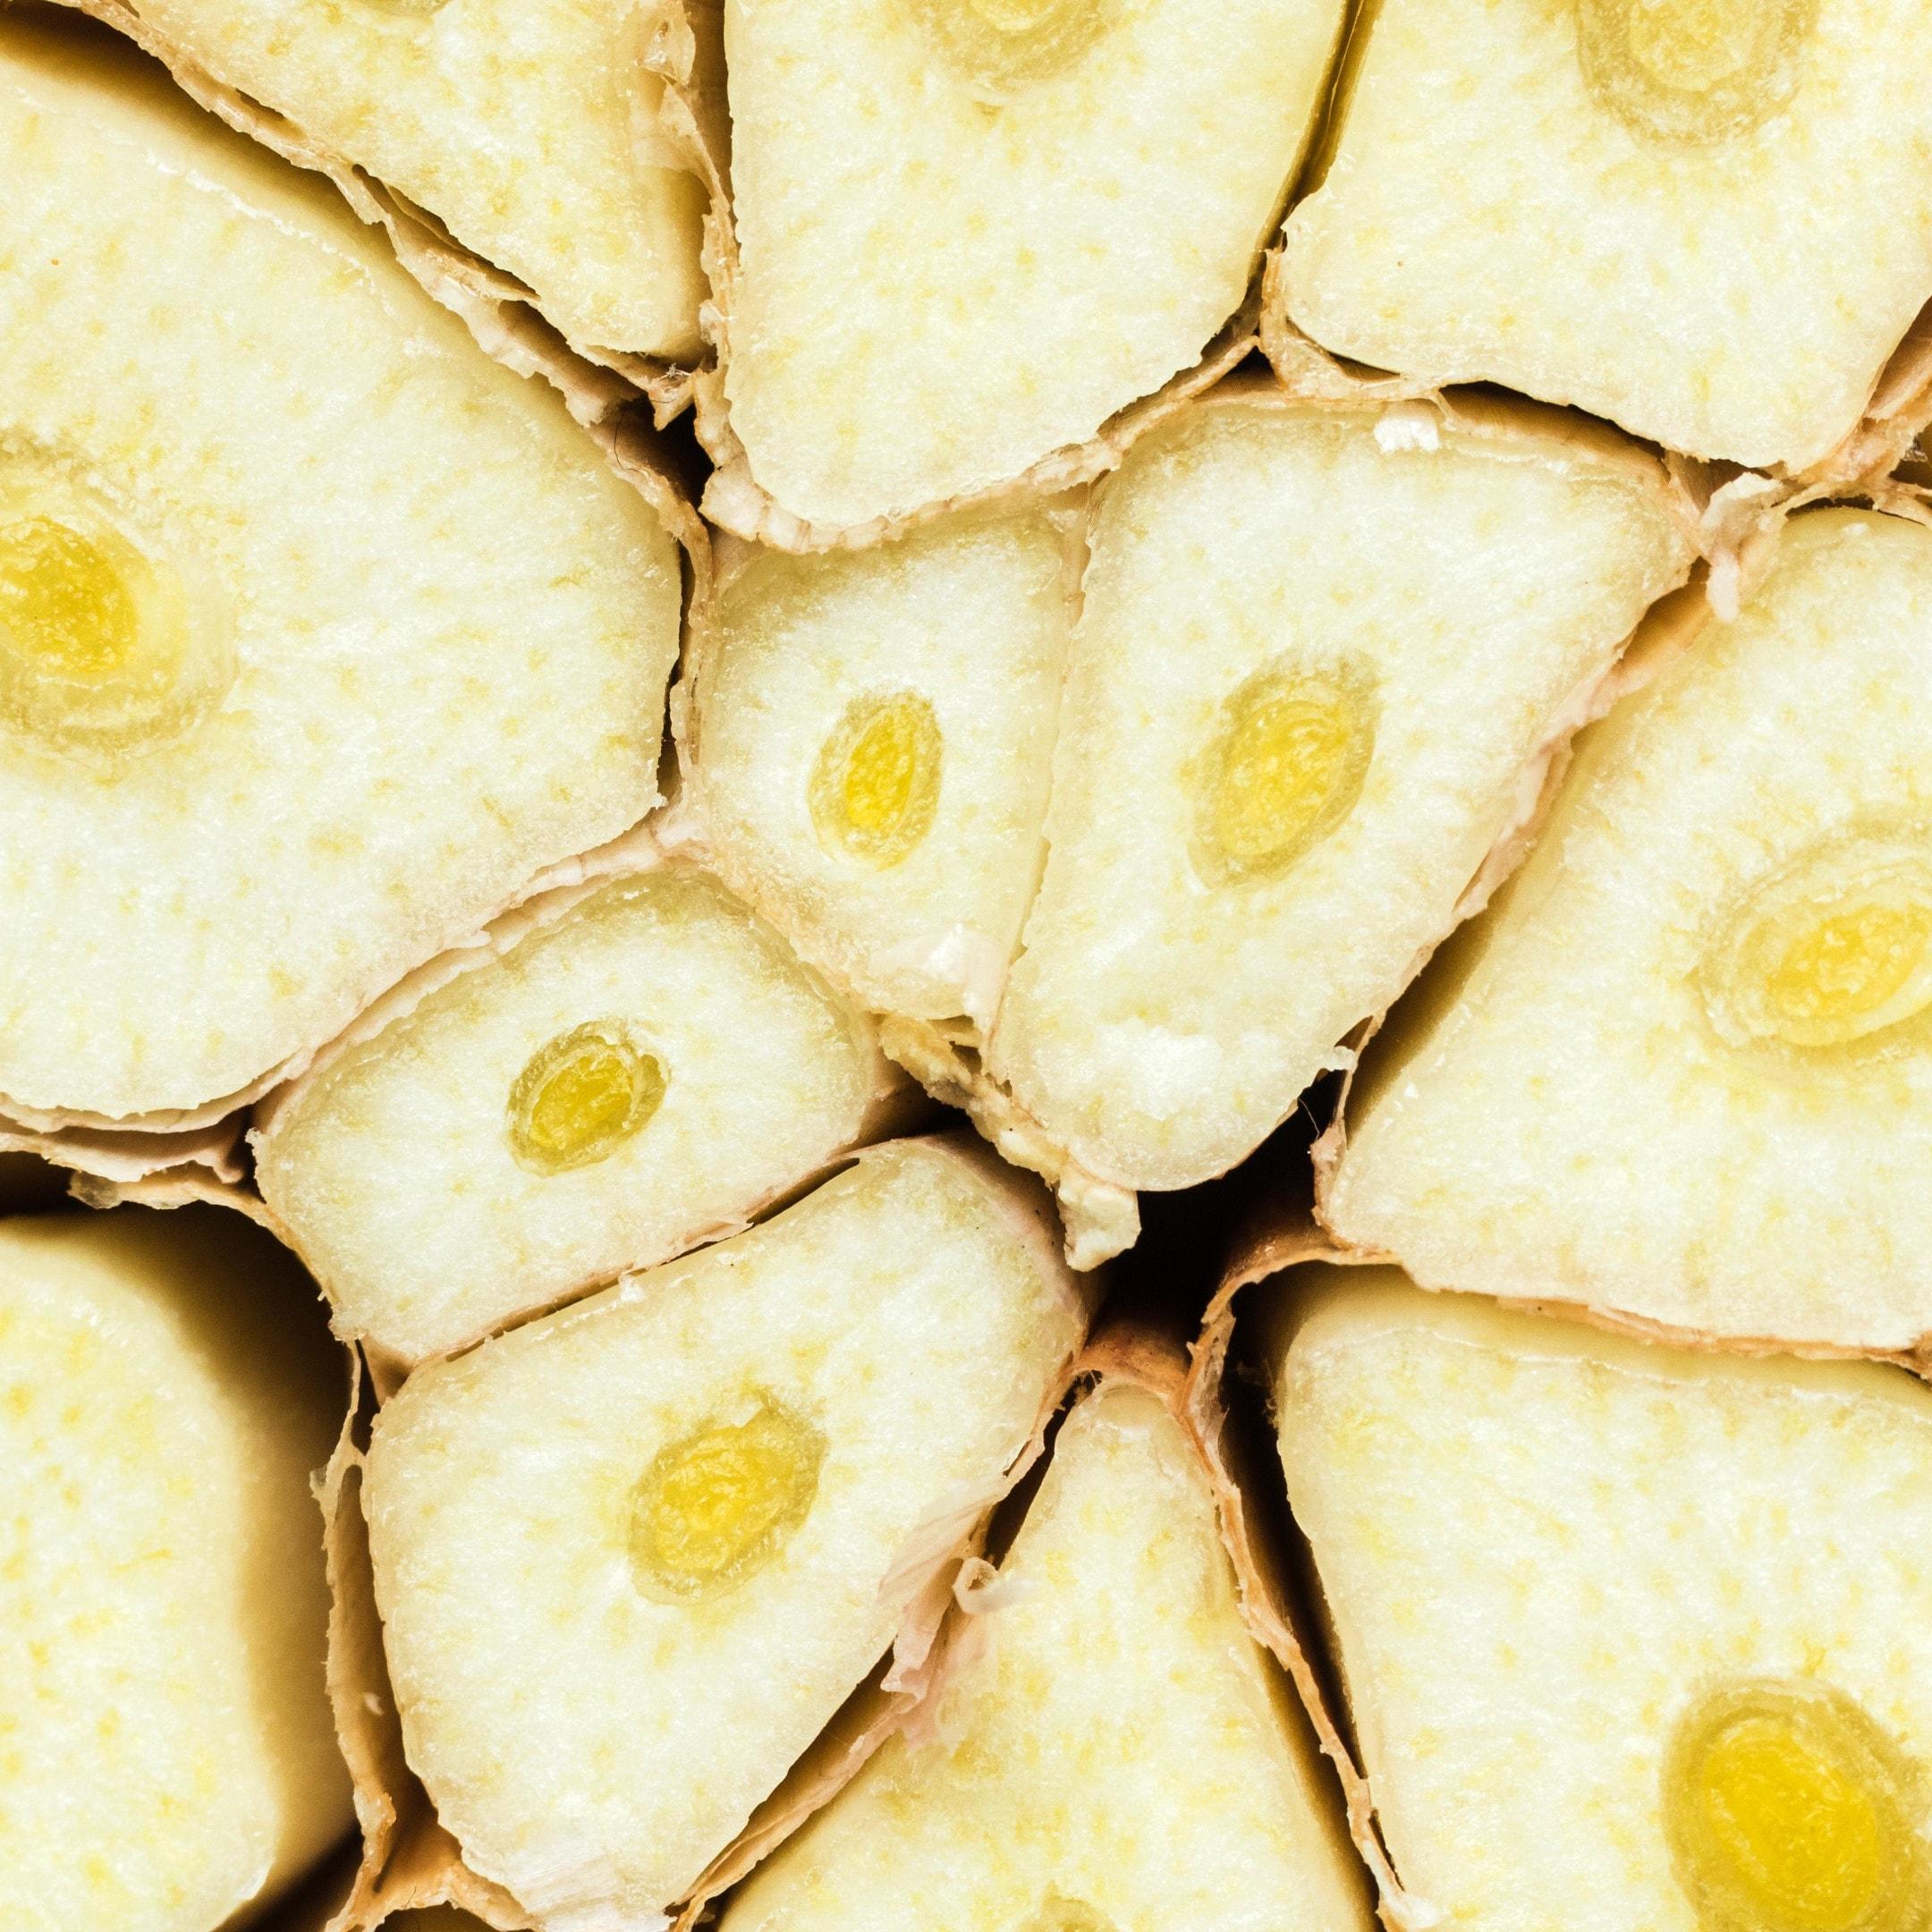 Close up of sliced garlic